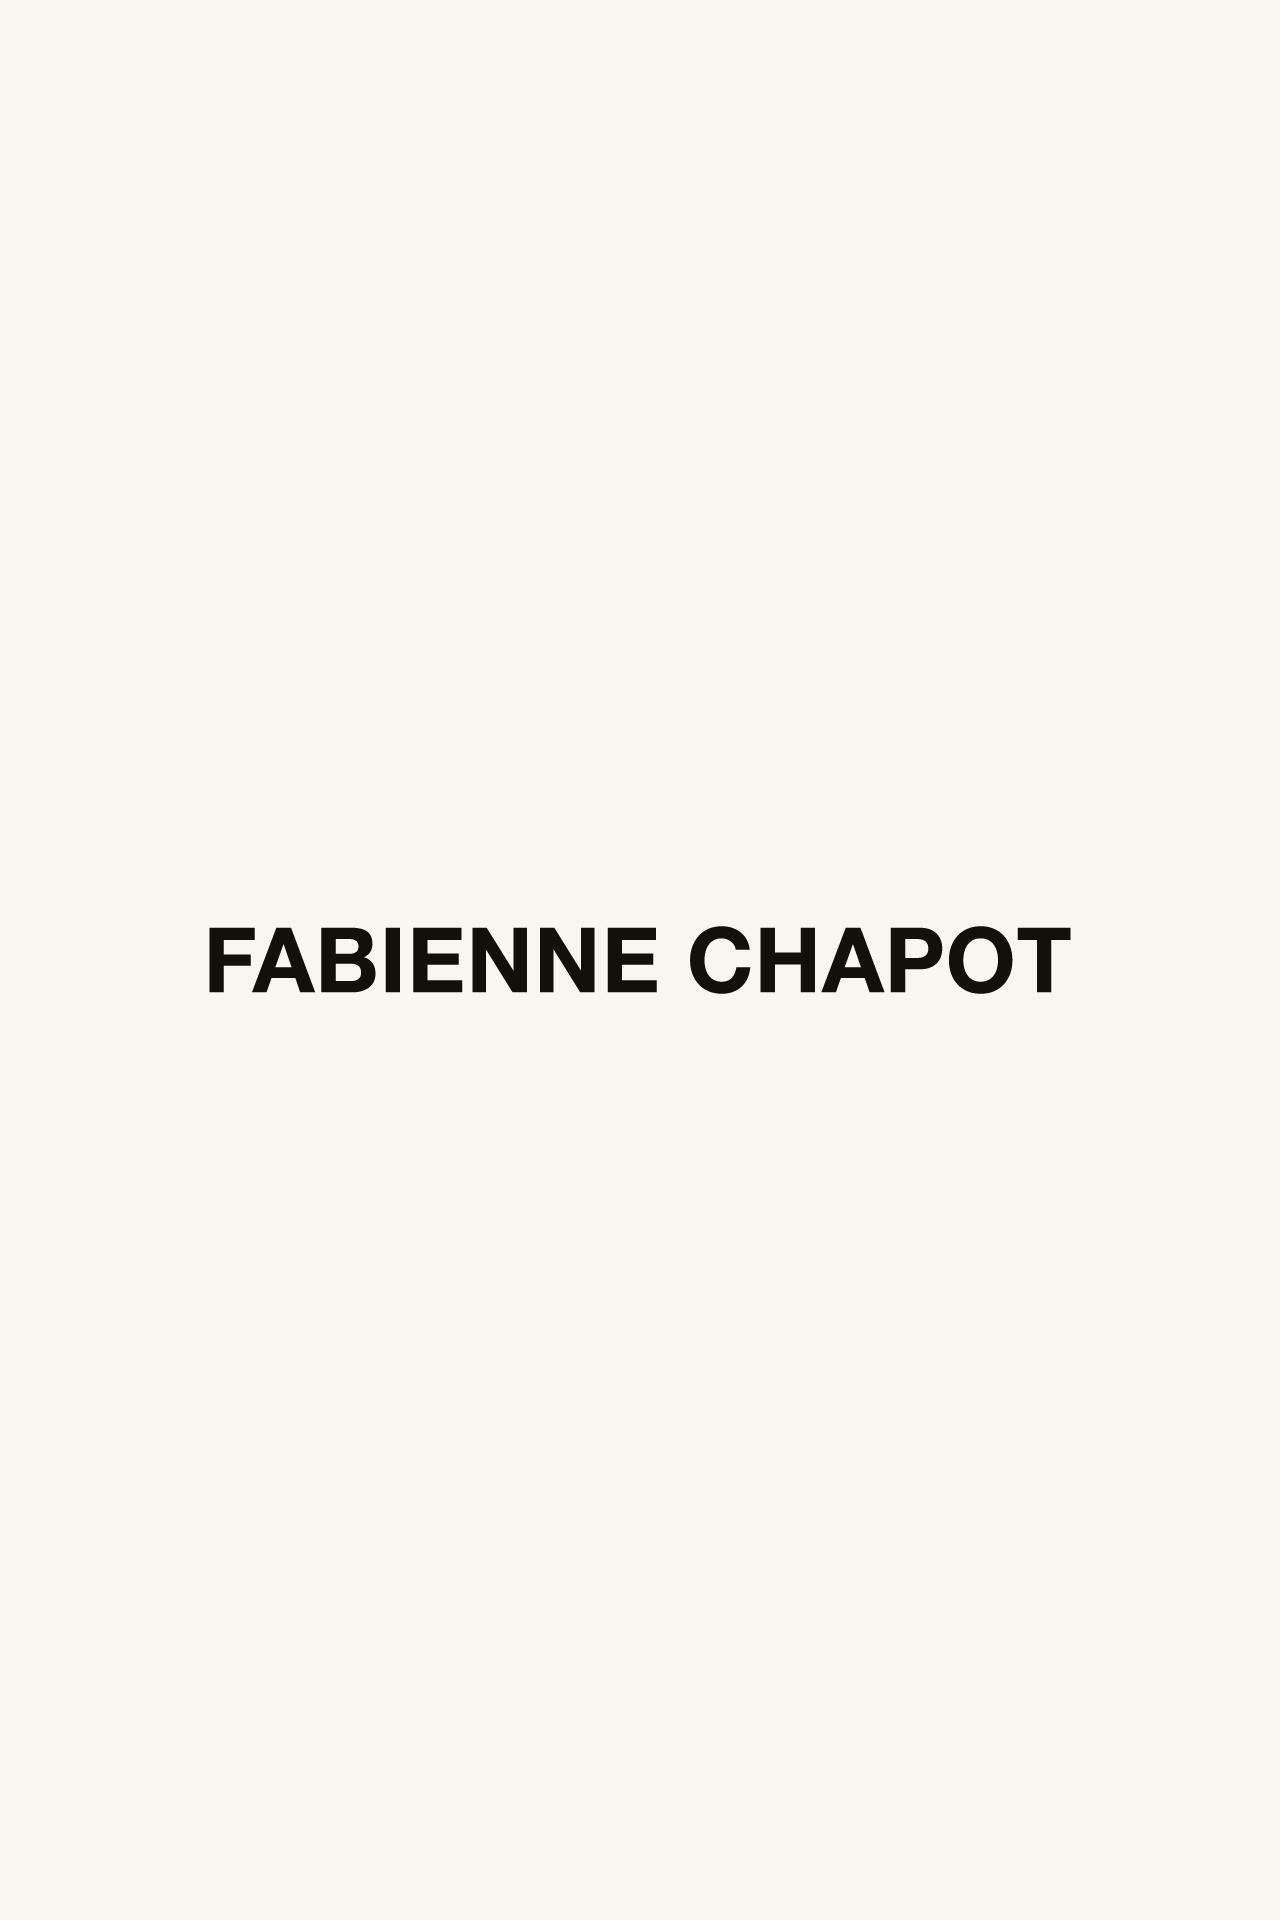 Fabelle